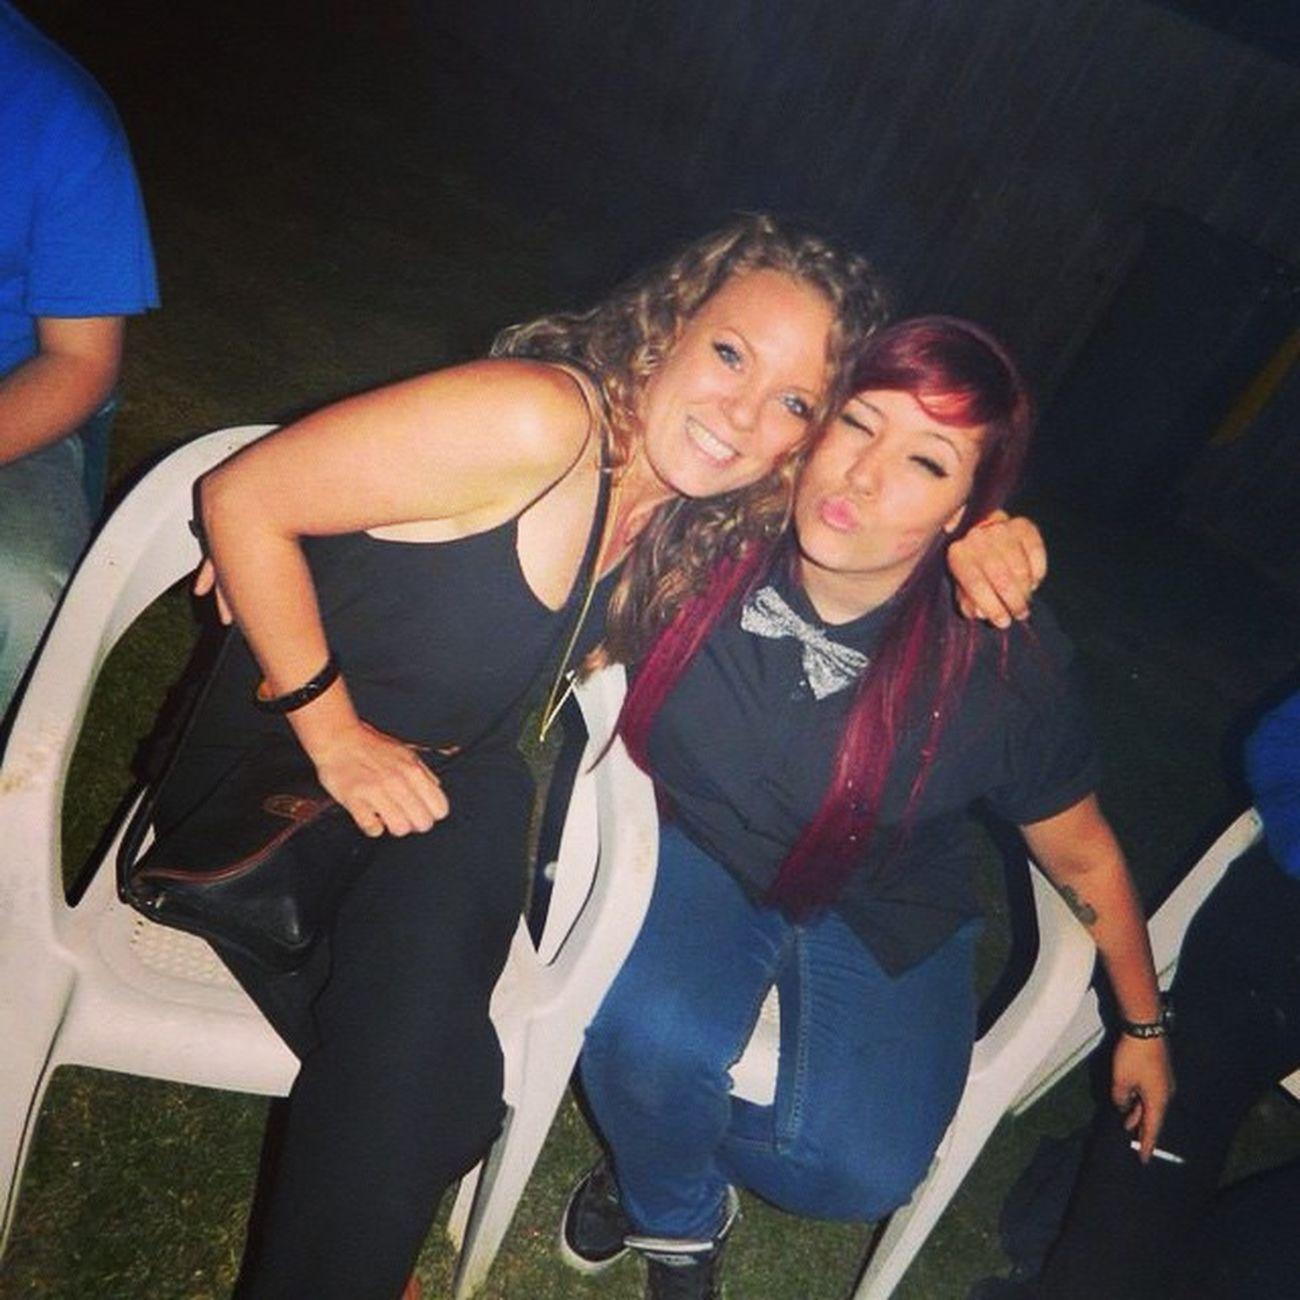 This girl ❤️Thisgirl  SheIs Beautiful And Amazing Bestnight Twentyfirst Party Bowtie Curlsgetthegirls Drunk Gorgeous Girlswholikegirls Instagay